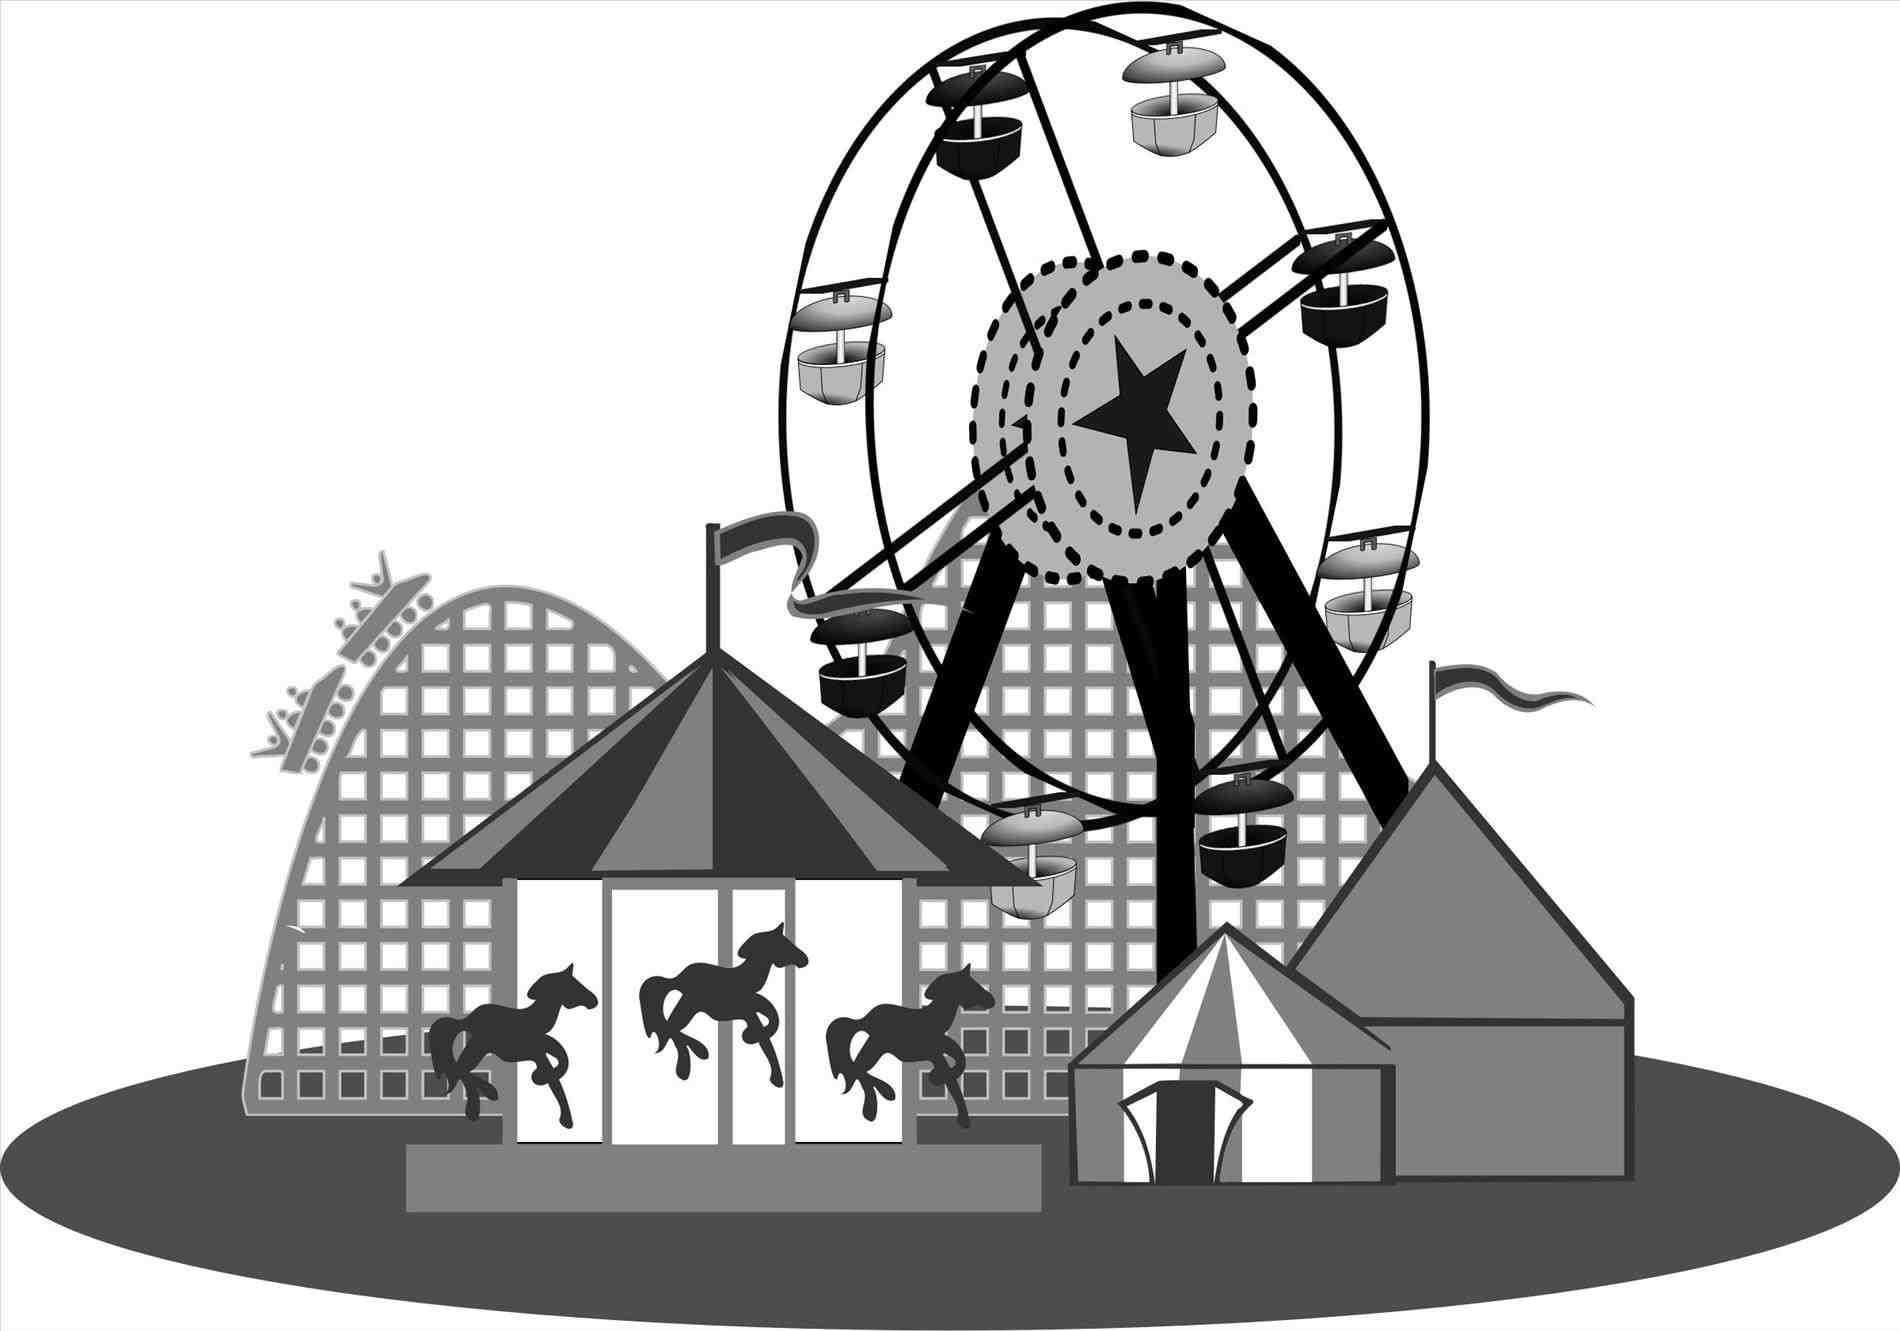 Games istiqomah website whitejpg. Carnival clipart black and white